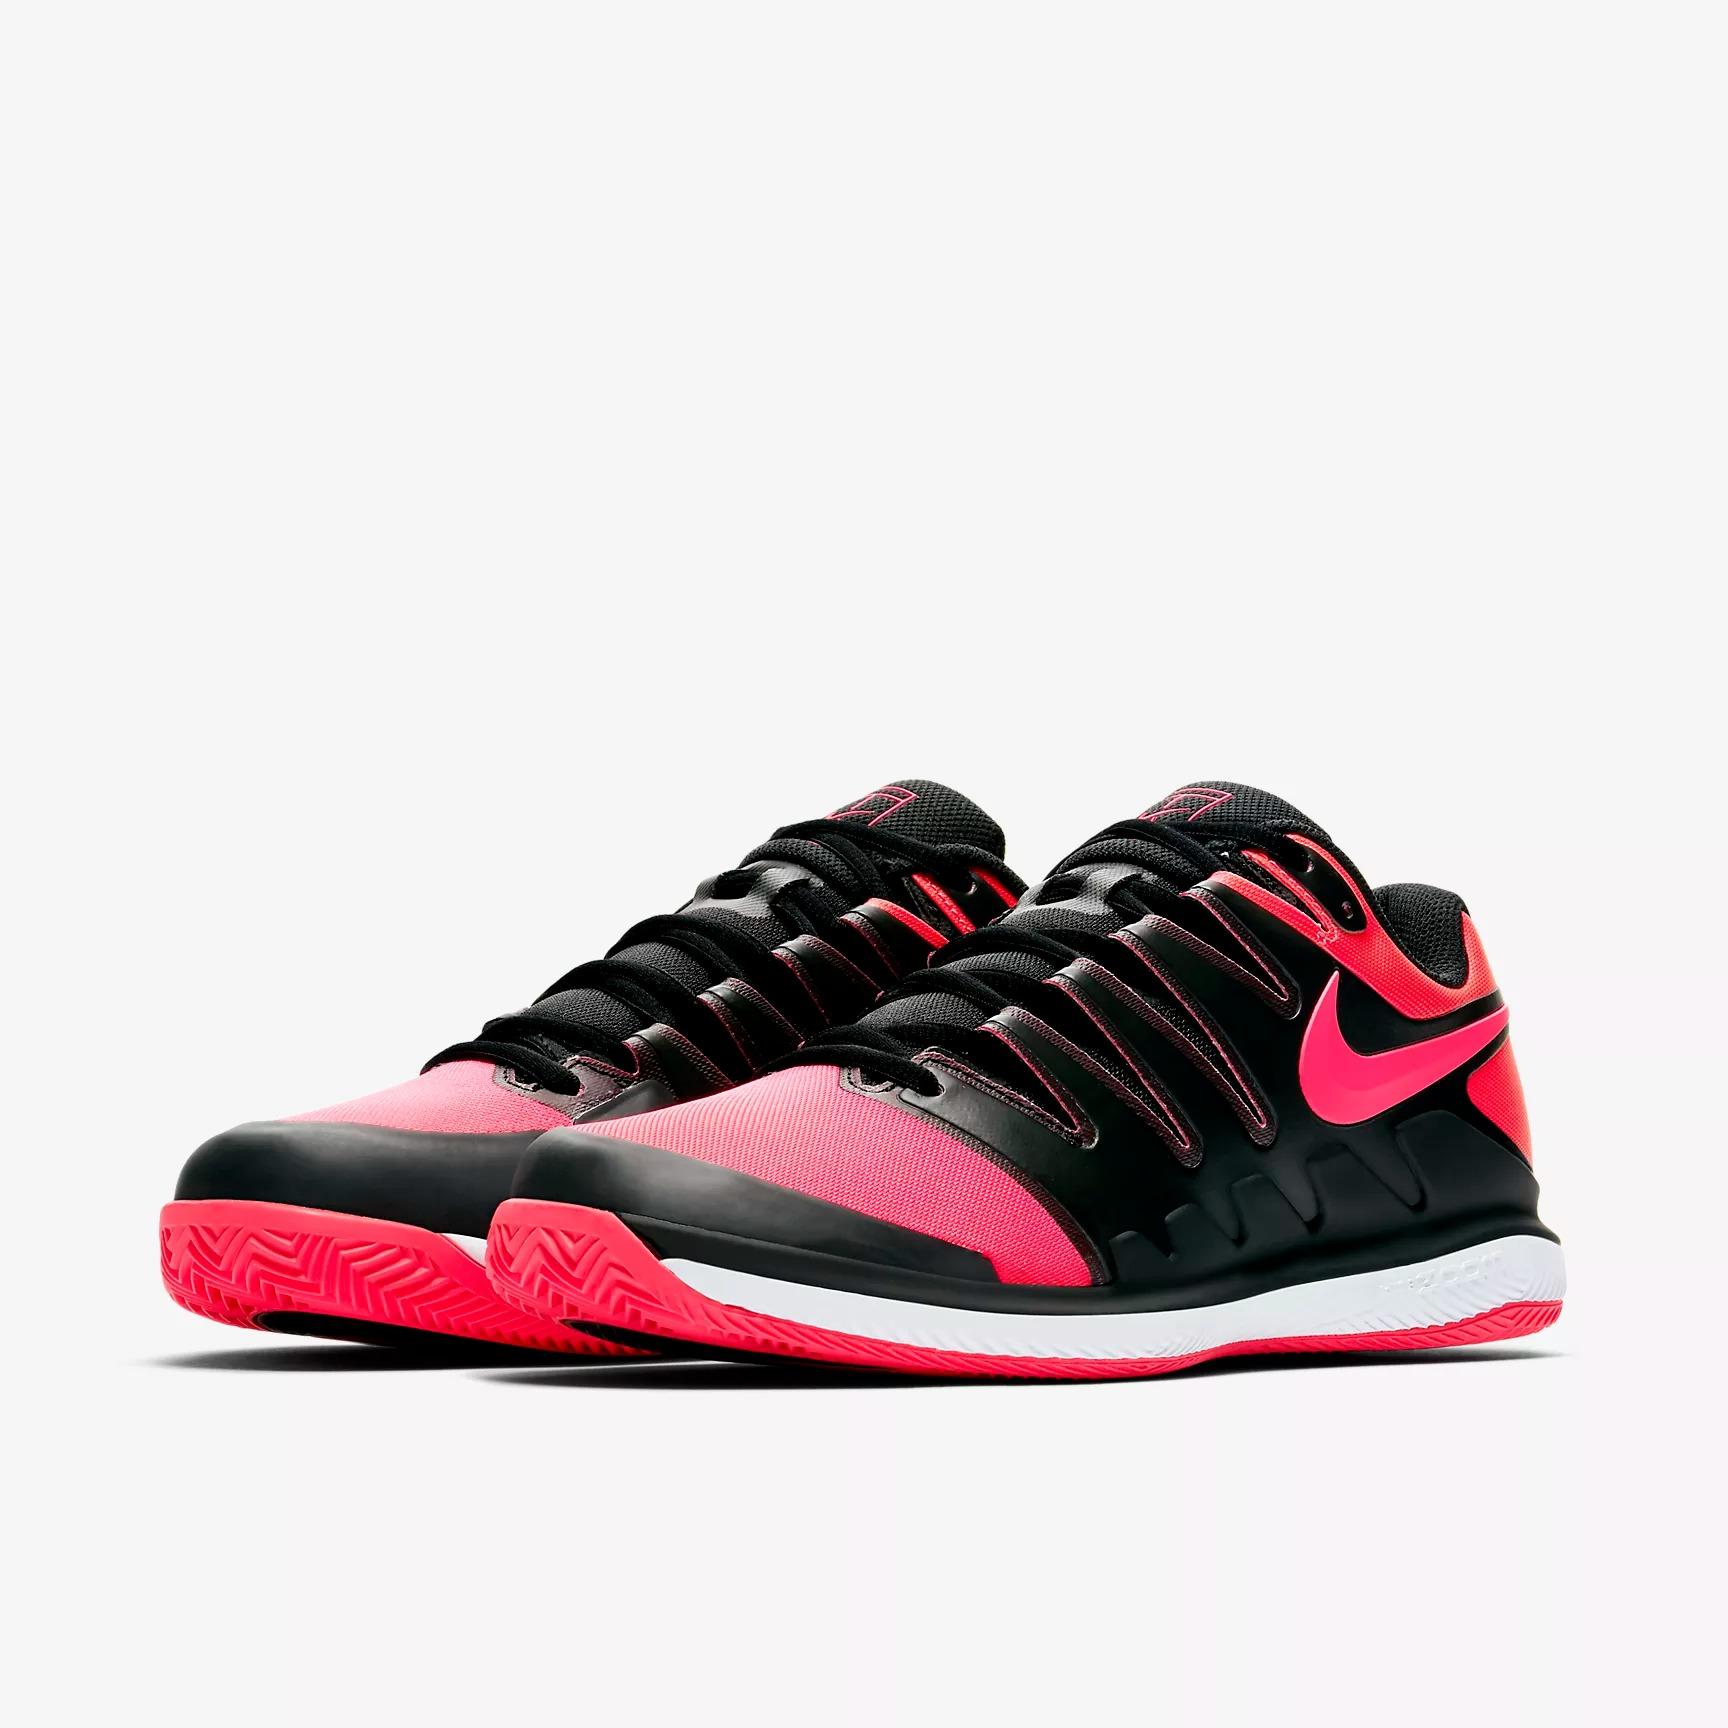 7e5cc8583abbc Nike Air Zoom Vapor X Clay Tennis Shoes - SPORT SHOES TENNIS SHOES -  Superfanas.lt